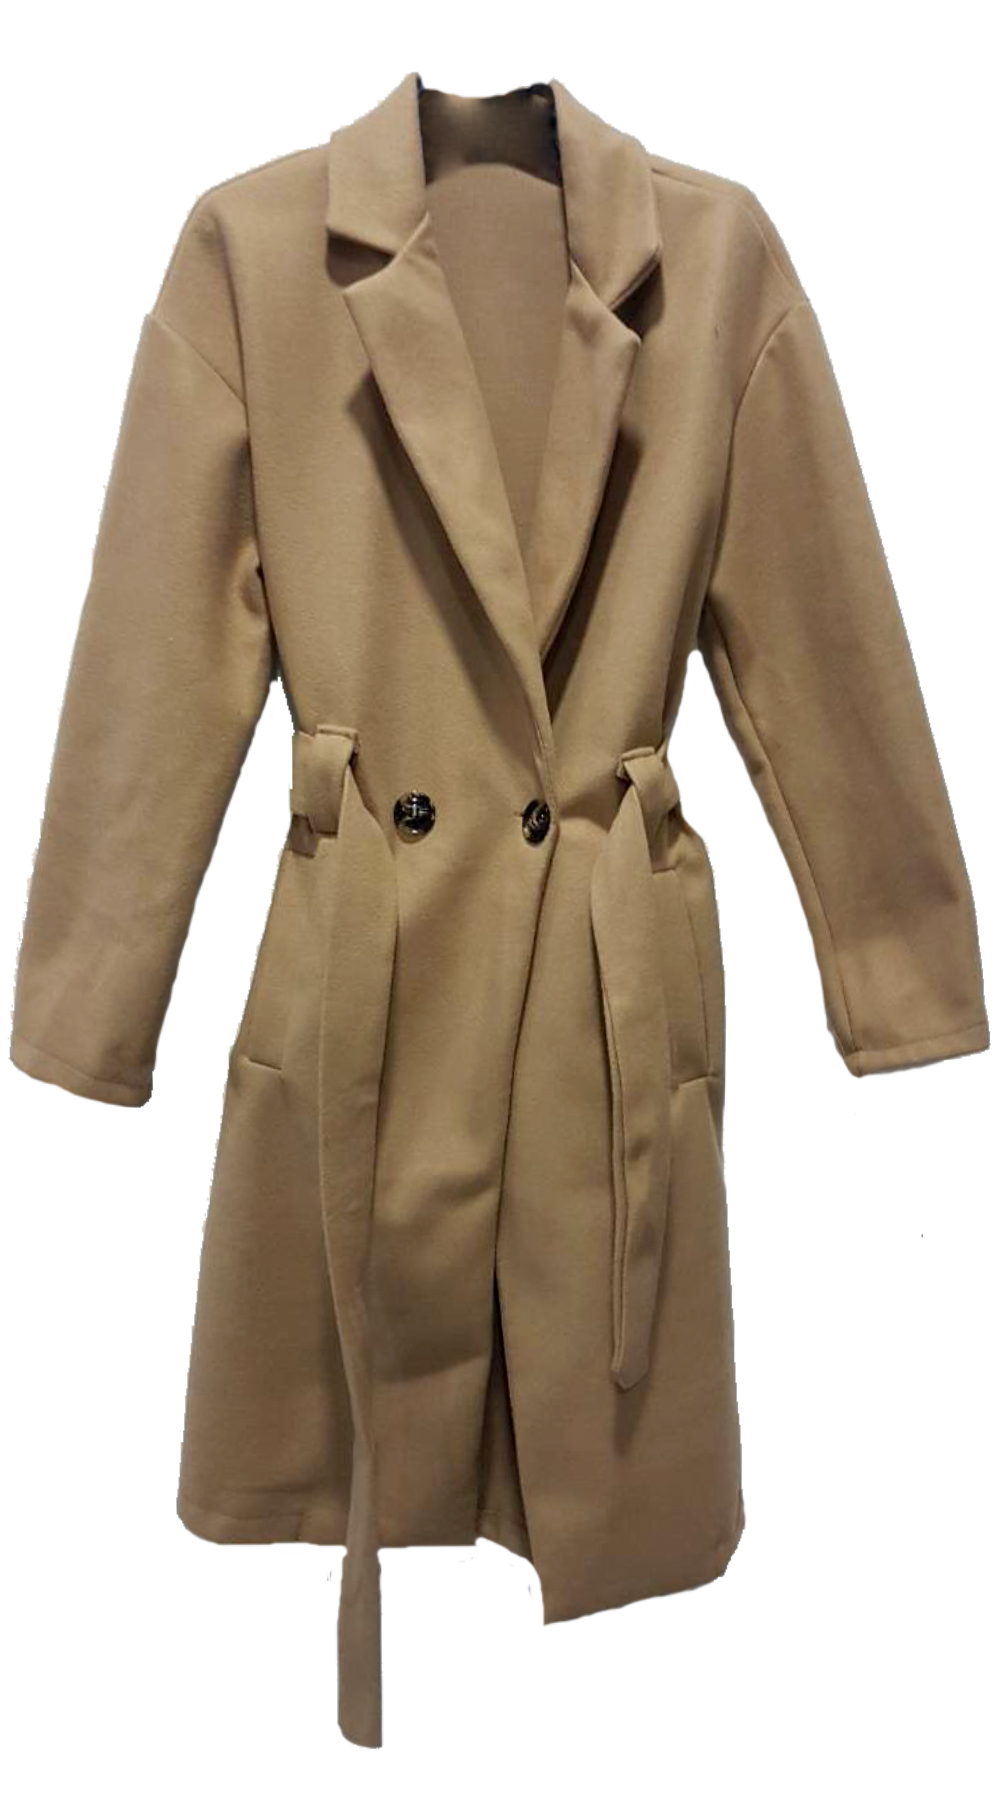 Lux Παλτό με ζώνη και τσέπες - MissReina - FW18JB-40522 πανωφόρια παλτό